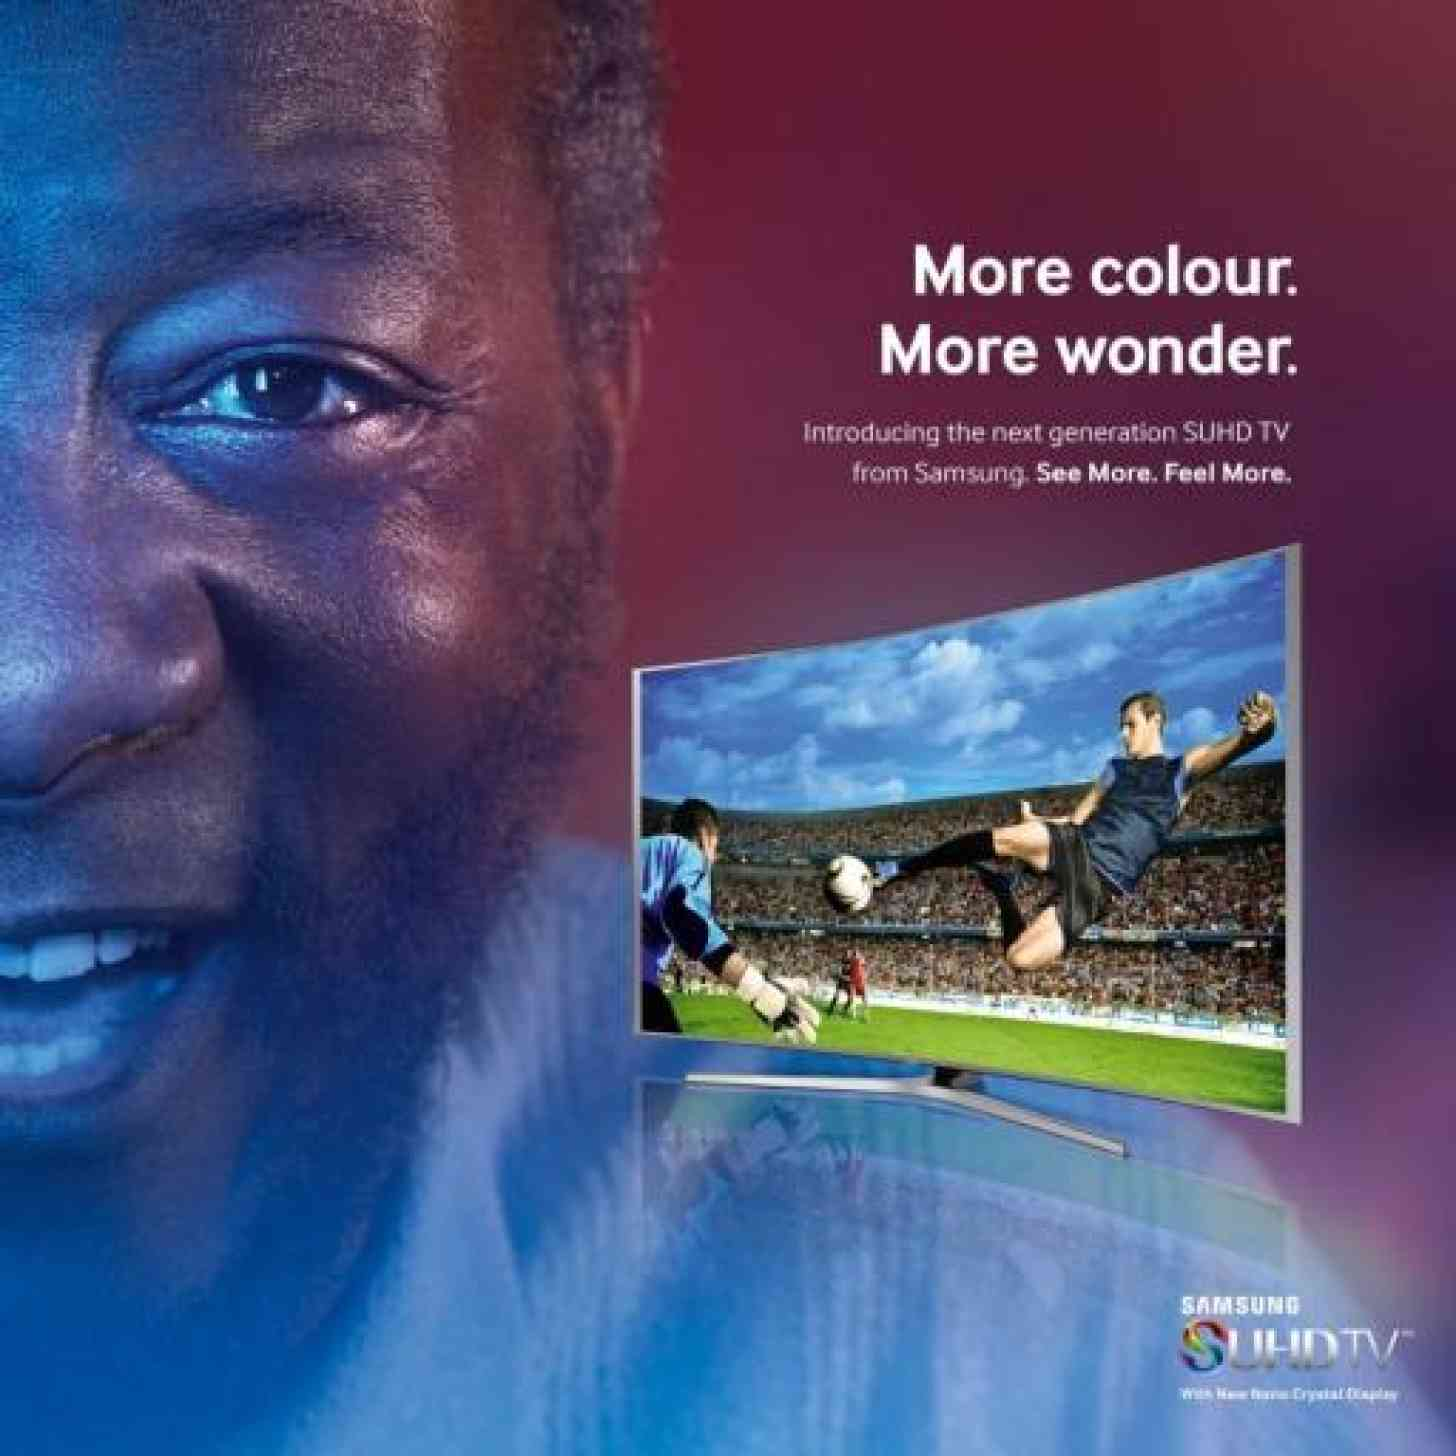 Brazilian soccer icon Pelé suing Samsung for $30 million